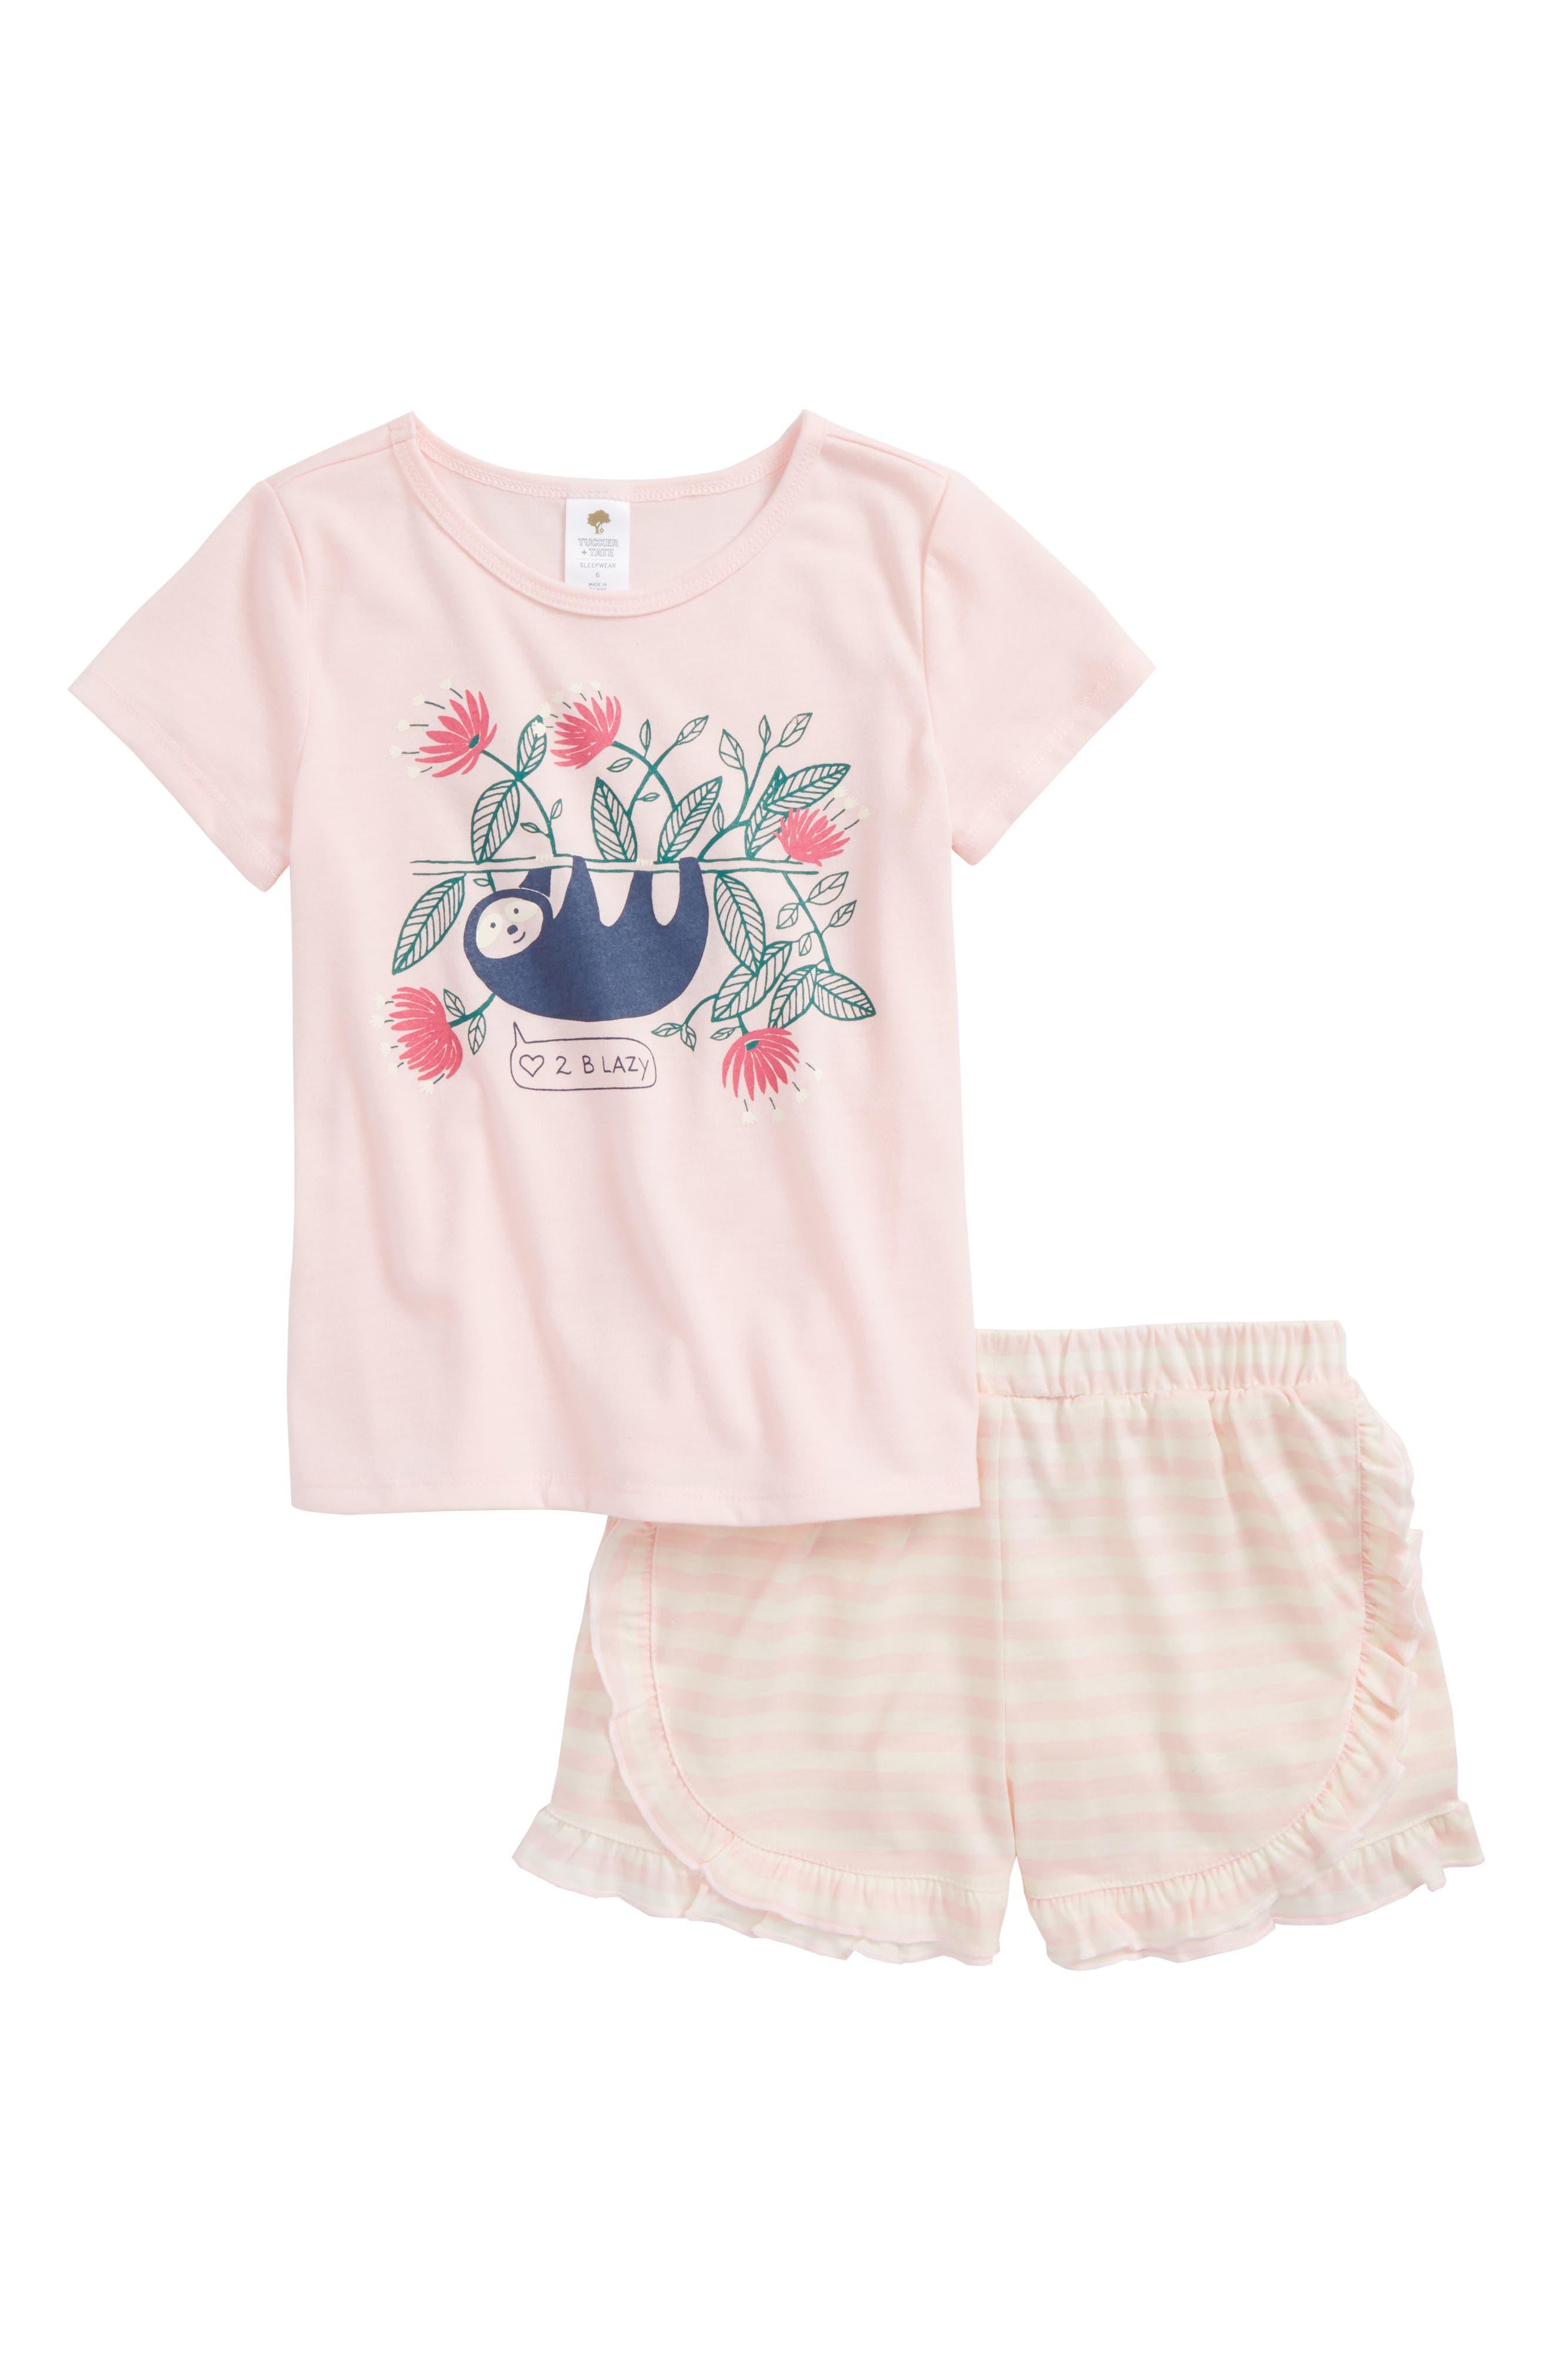 Two-Piece Pajamas,                             Main thumbnail 1, color,                             680